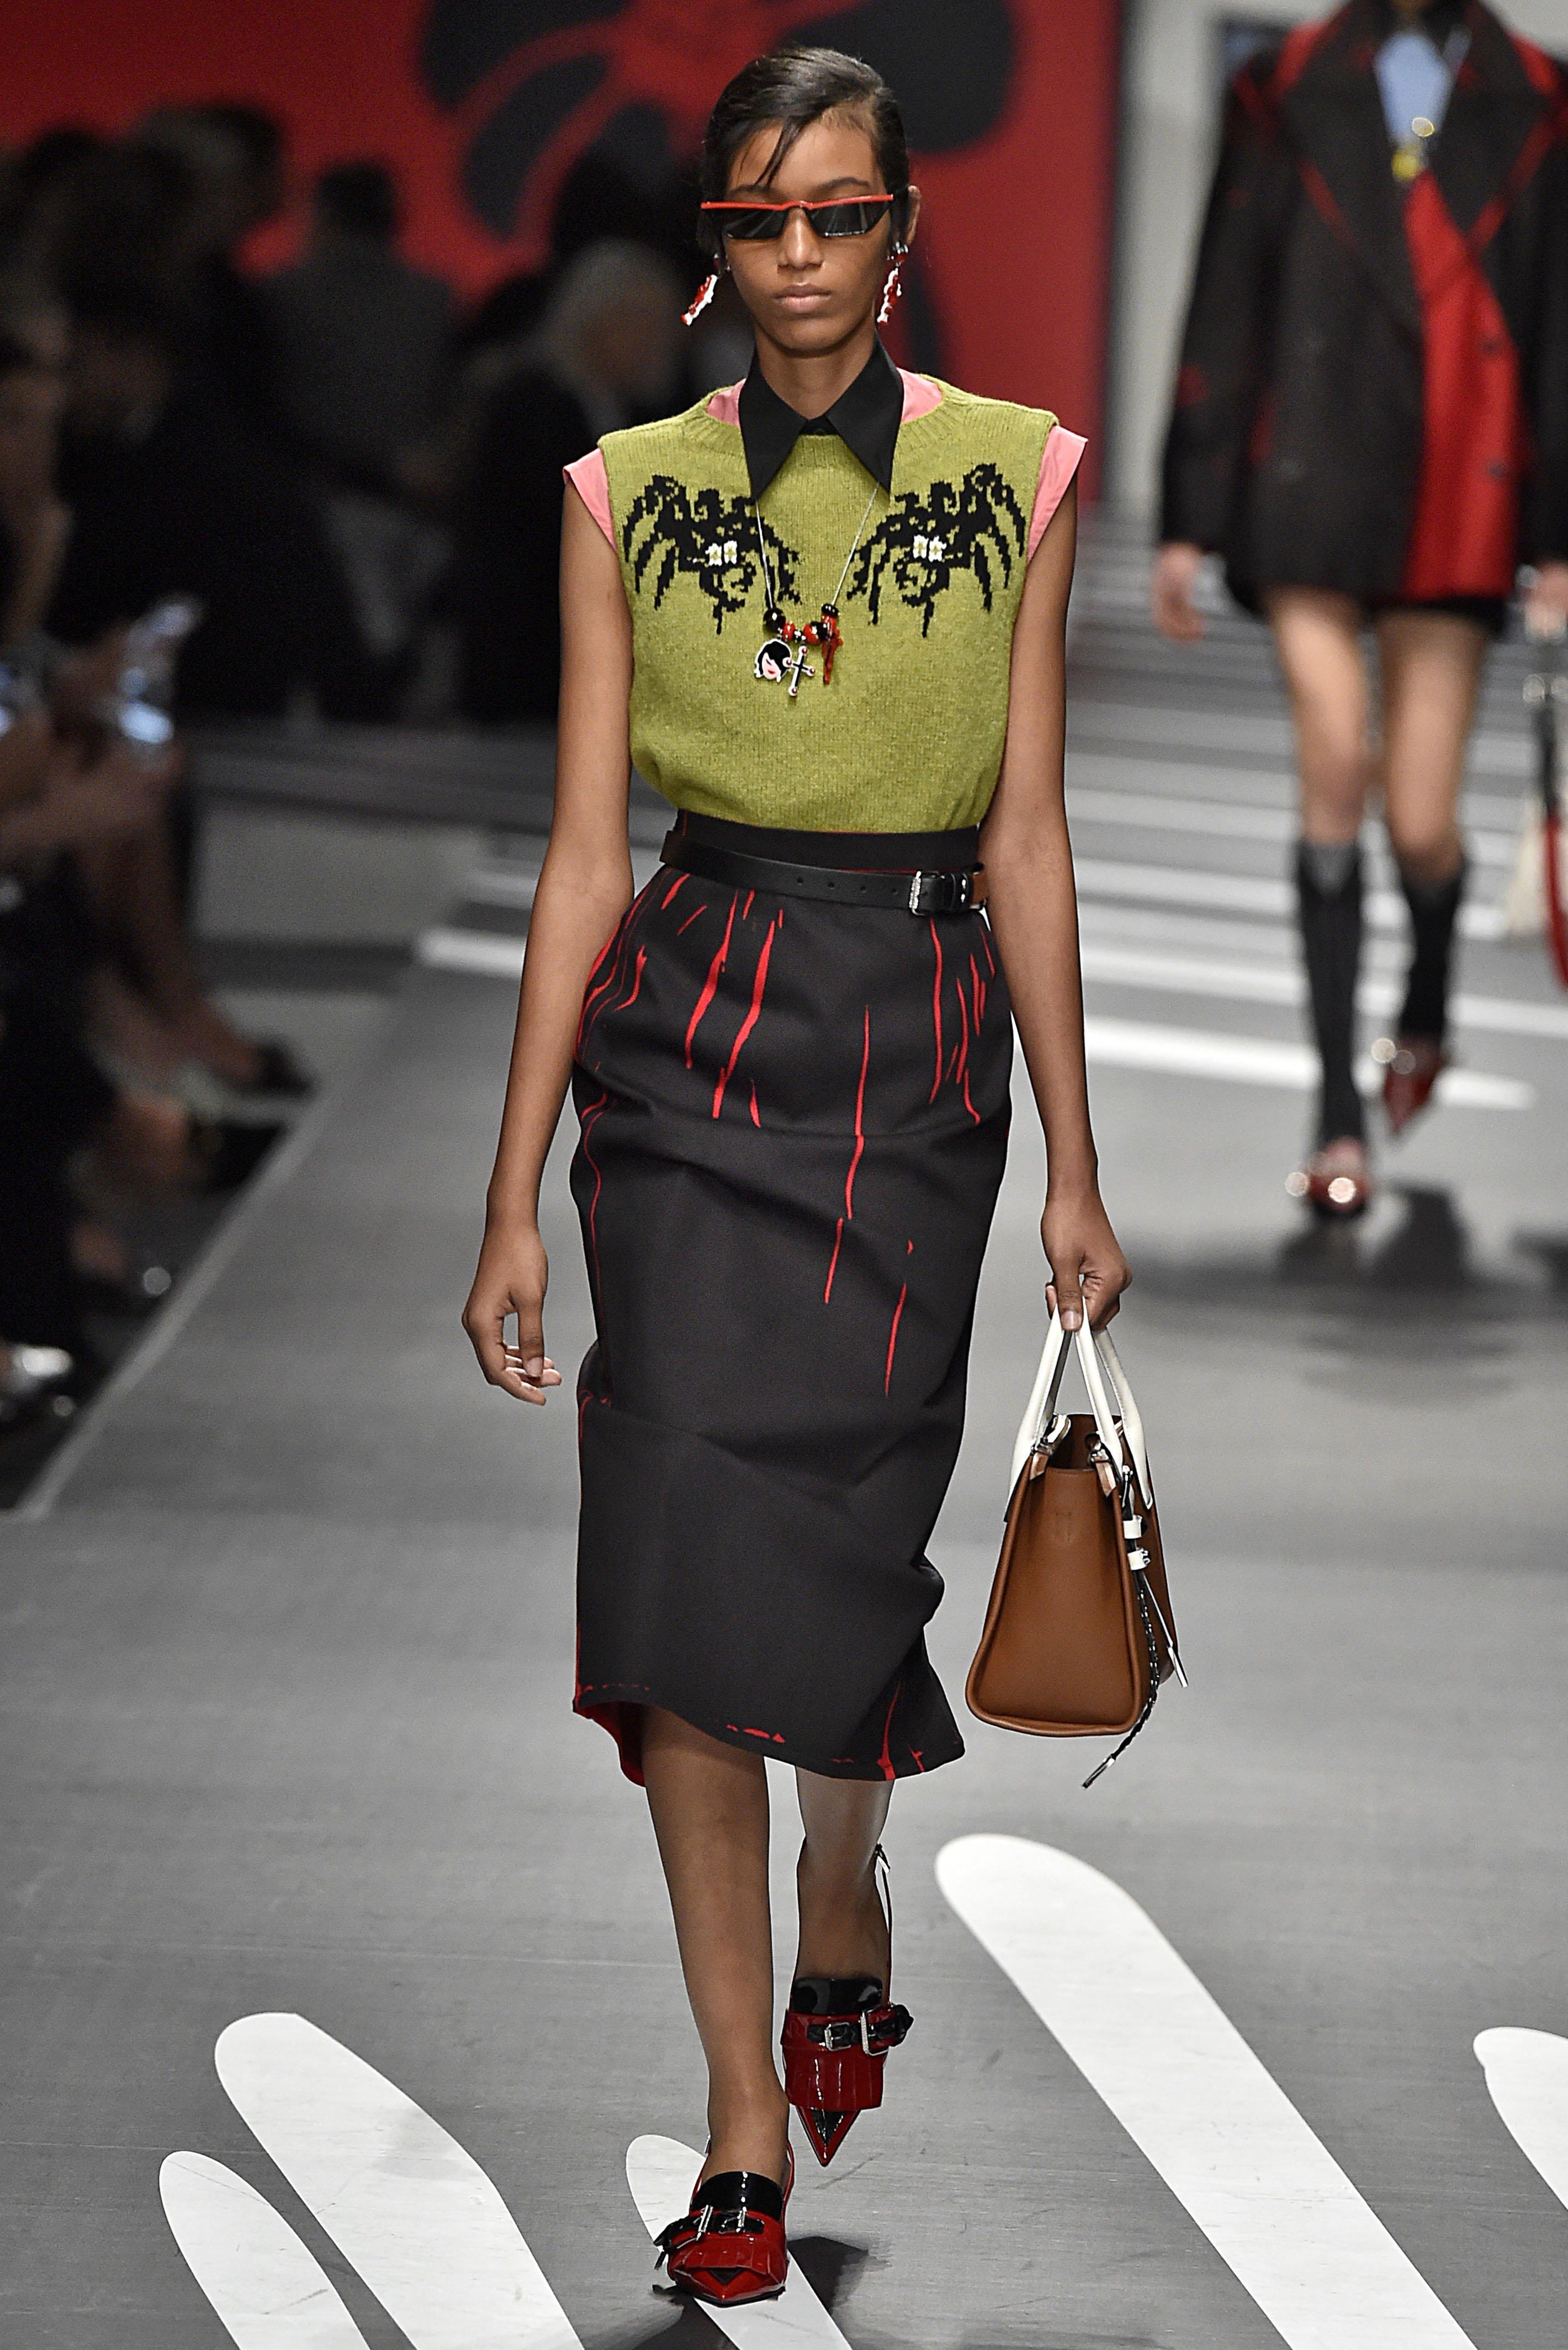 Prada Milan Fashion Week Spring Summer 2018 Milan September 2017, Image: 350140534, License: Rights-managed, Restrictions: , Model Release: no, Credit line: Profimedia, FirstView